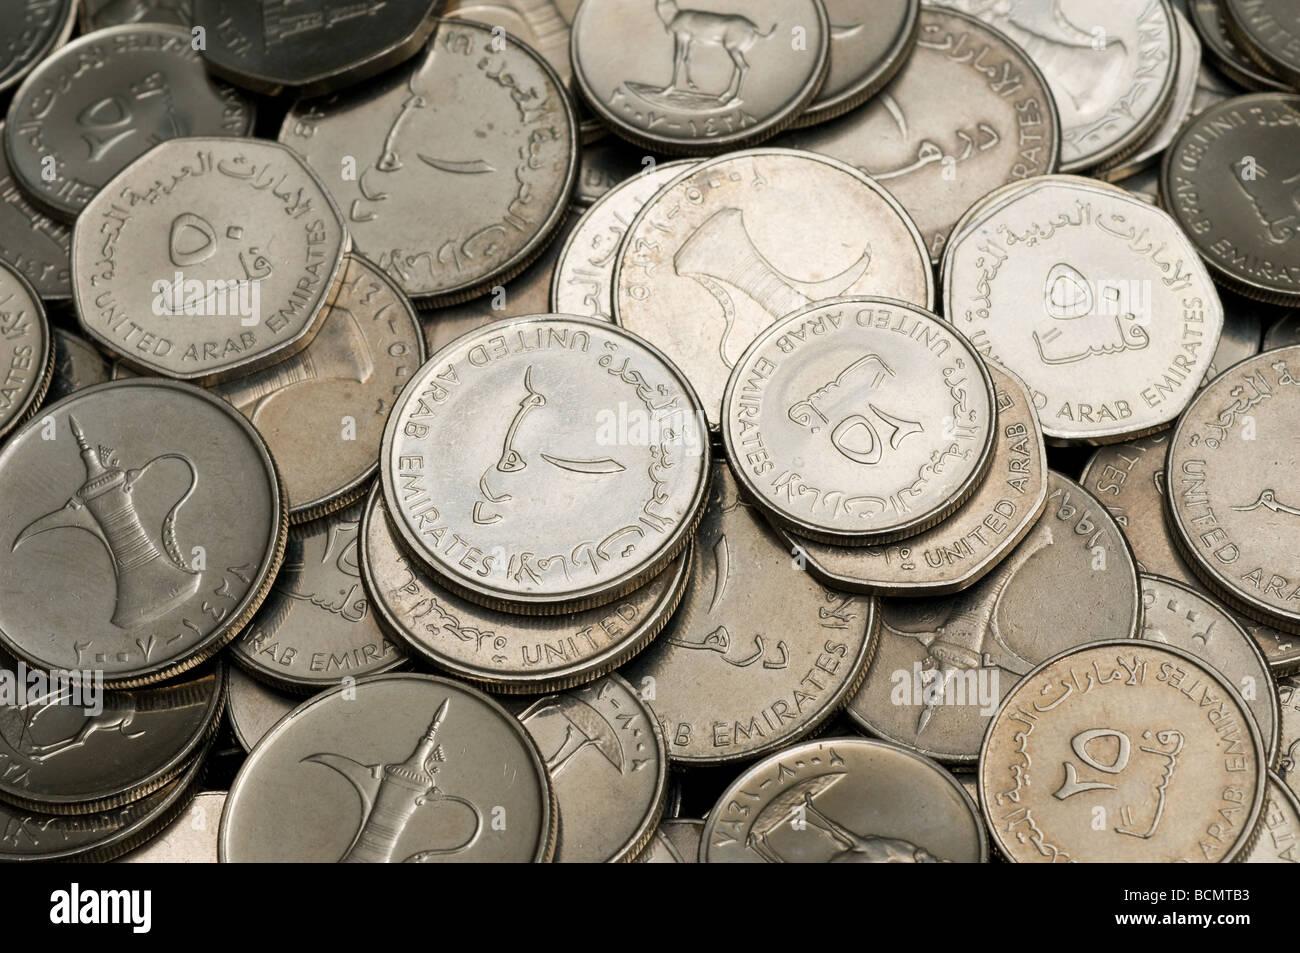 Dubai currency stock photos dubai currency stock images alamy uae dirham coins stock image biocorpaavc